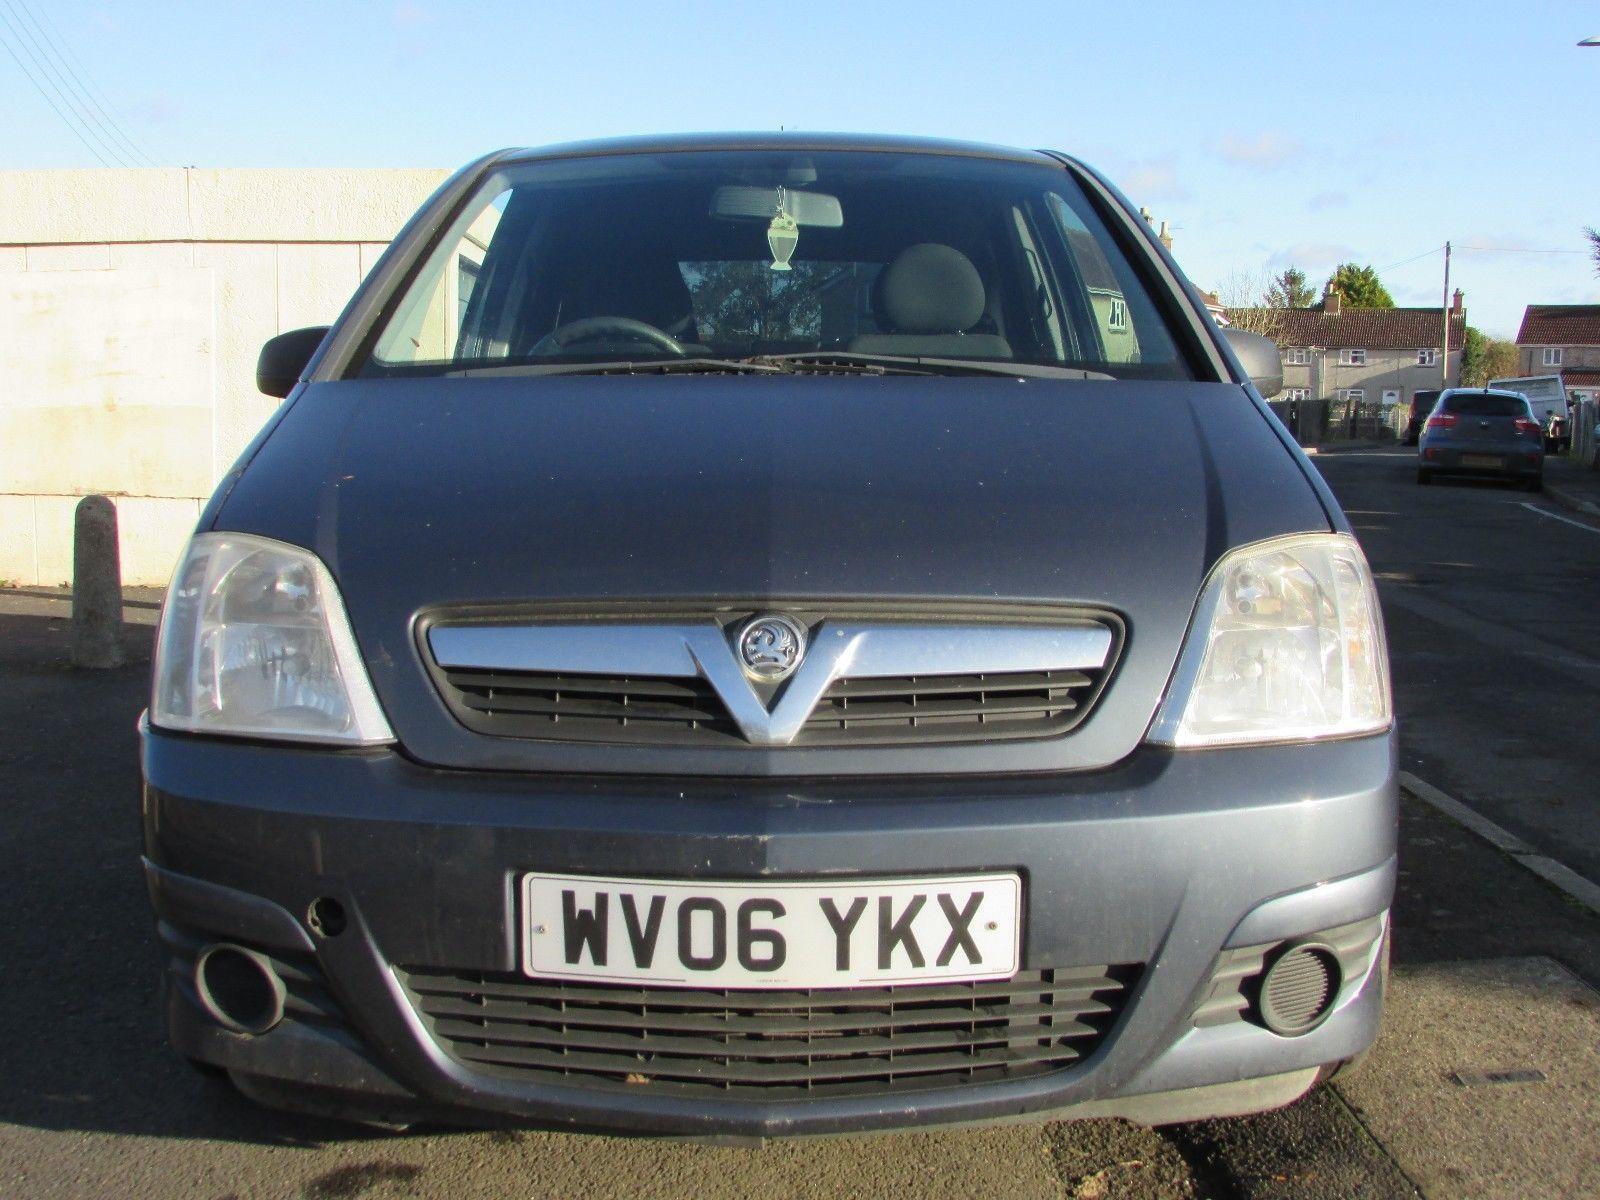 eBay: 2006 Vauxhall Meriva Active E-Tronic, Spares or Repairs Short ...